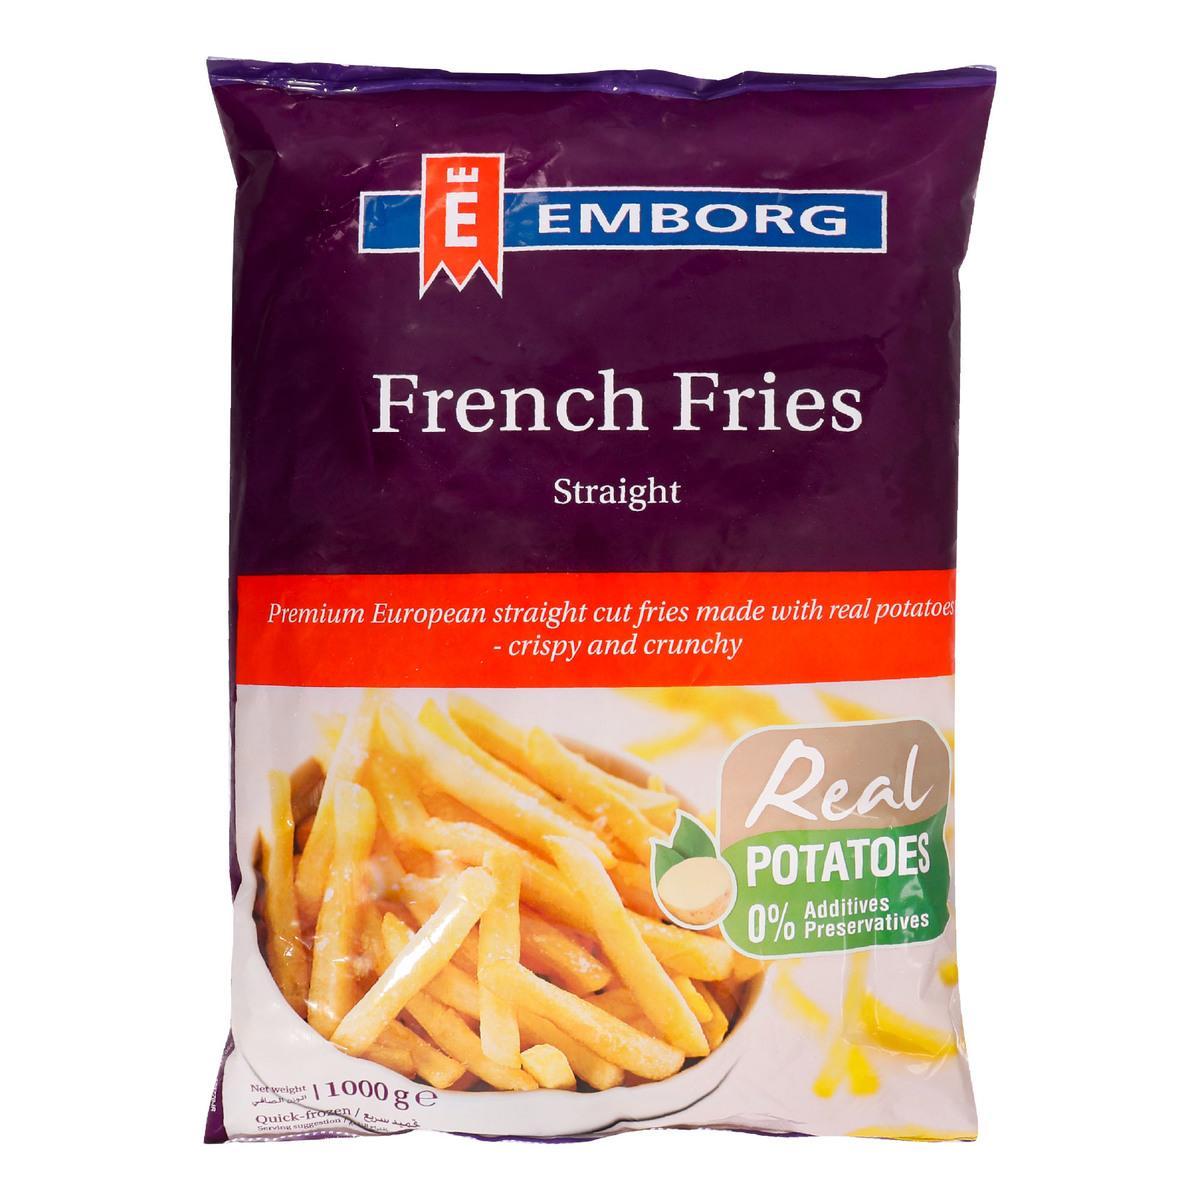 Emborg French Fries Straight